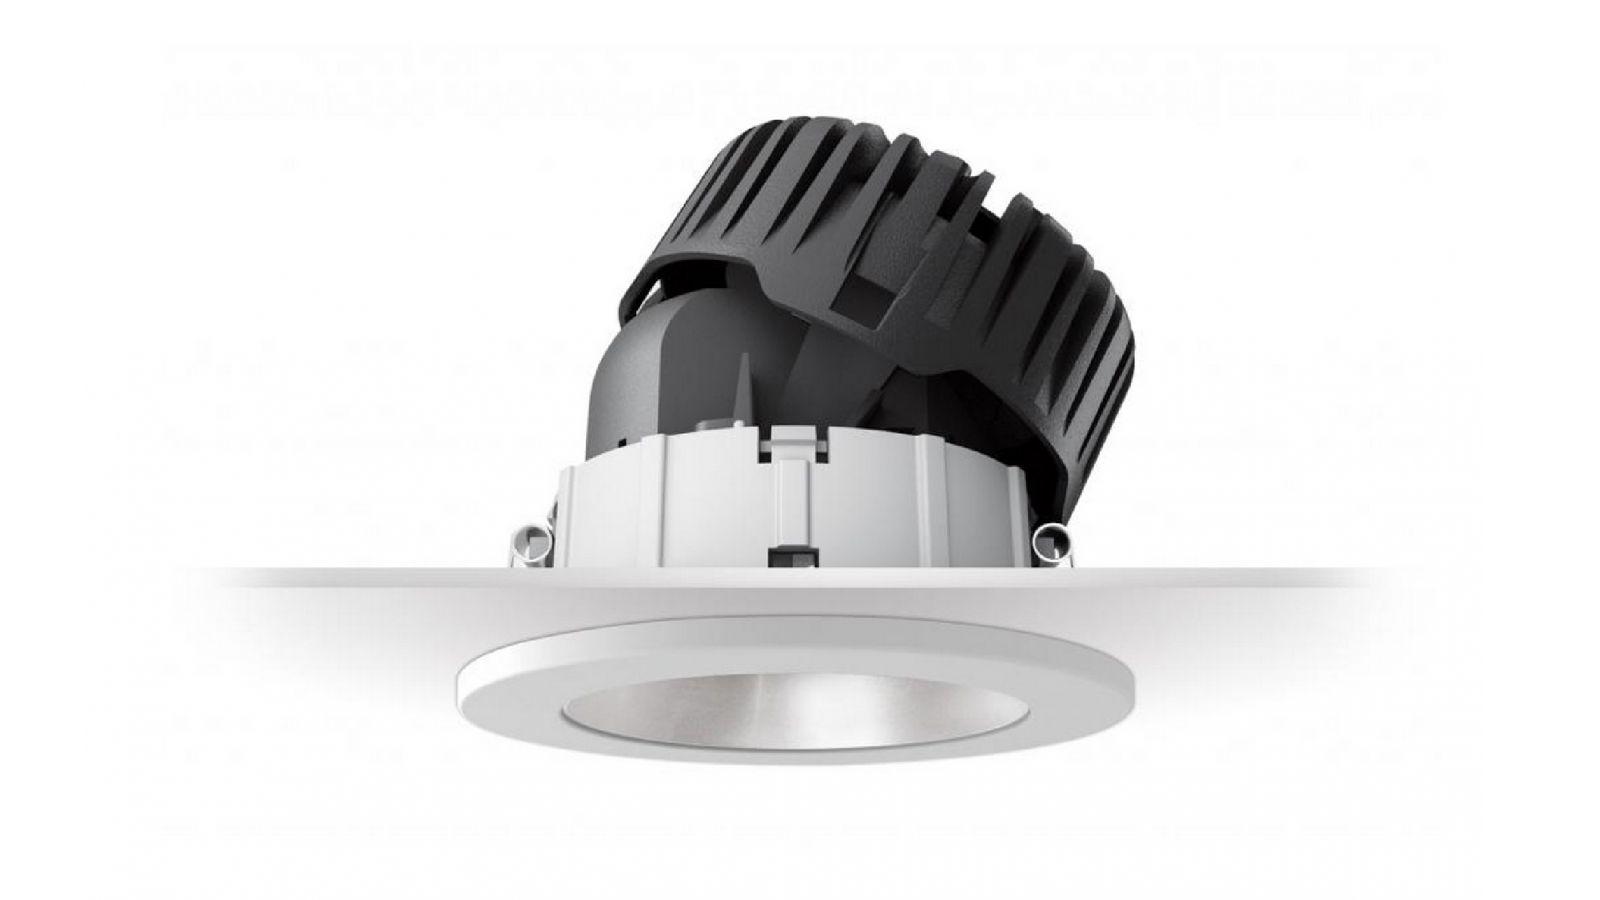 CCT LED Architectural Mini Adjustable